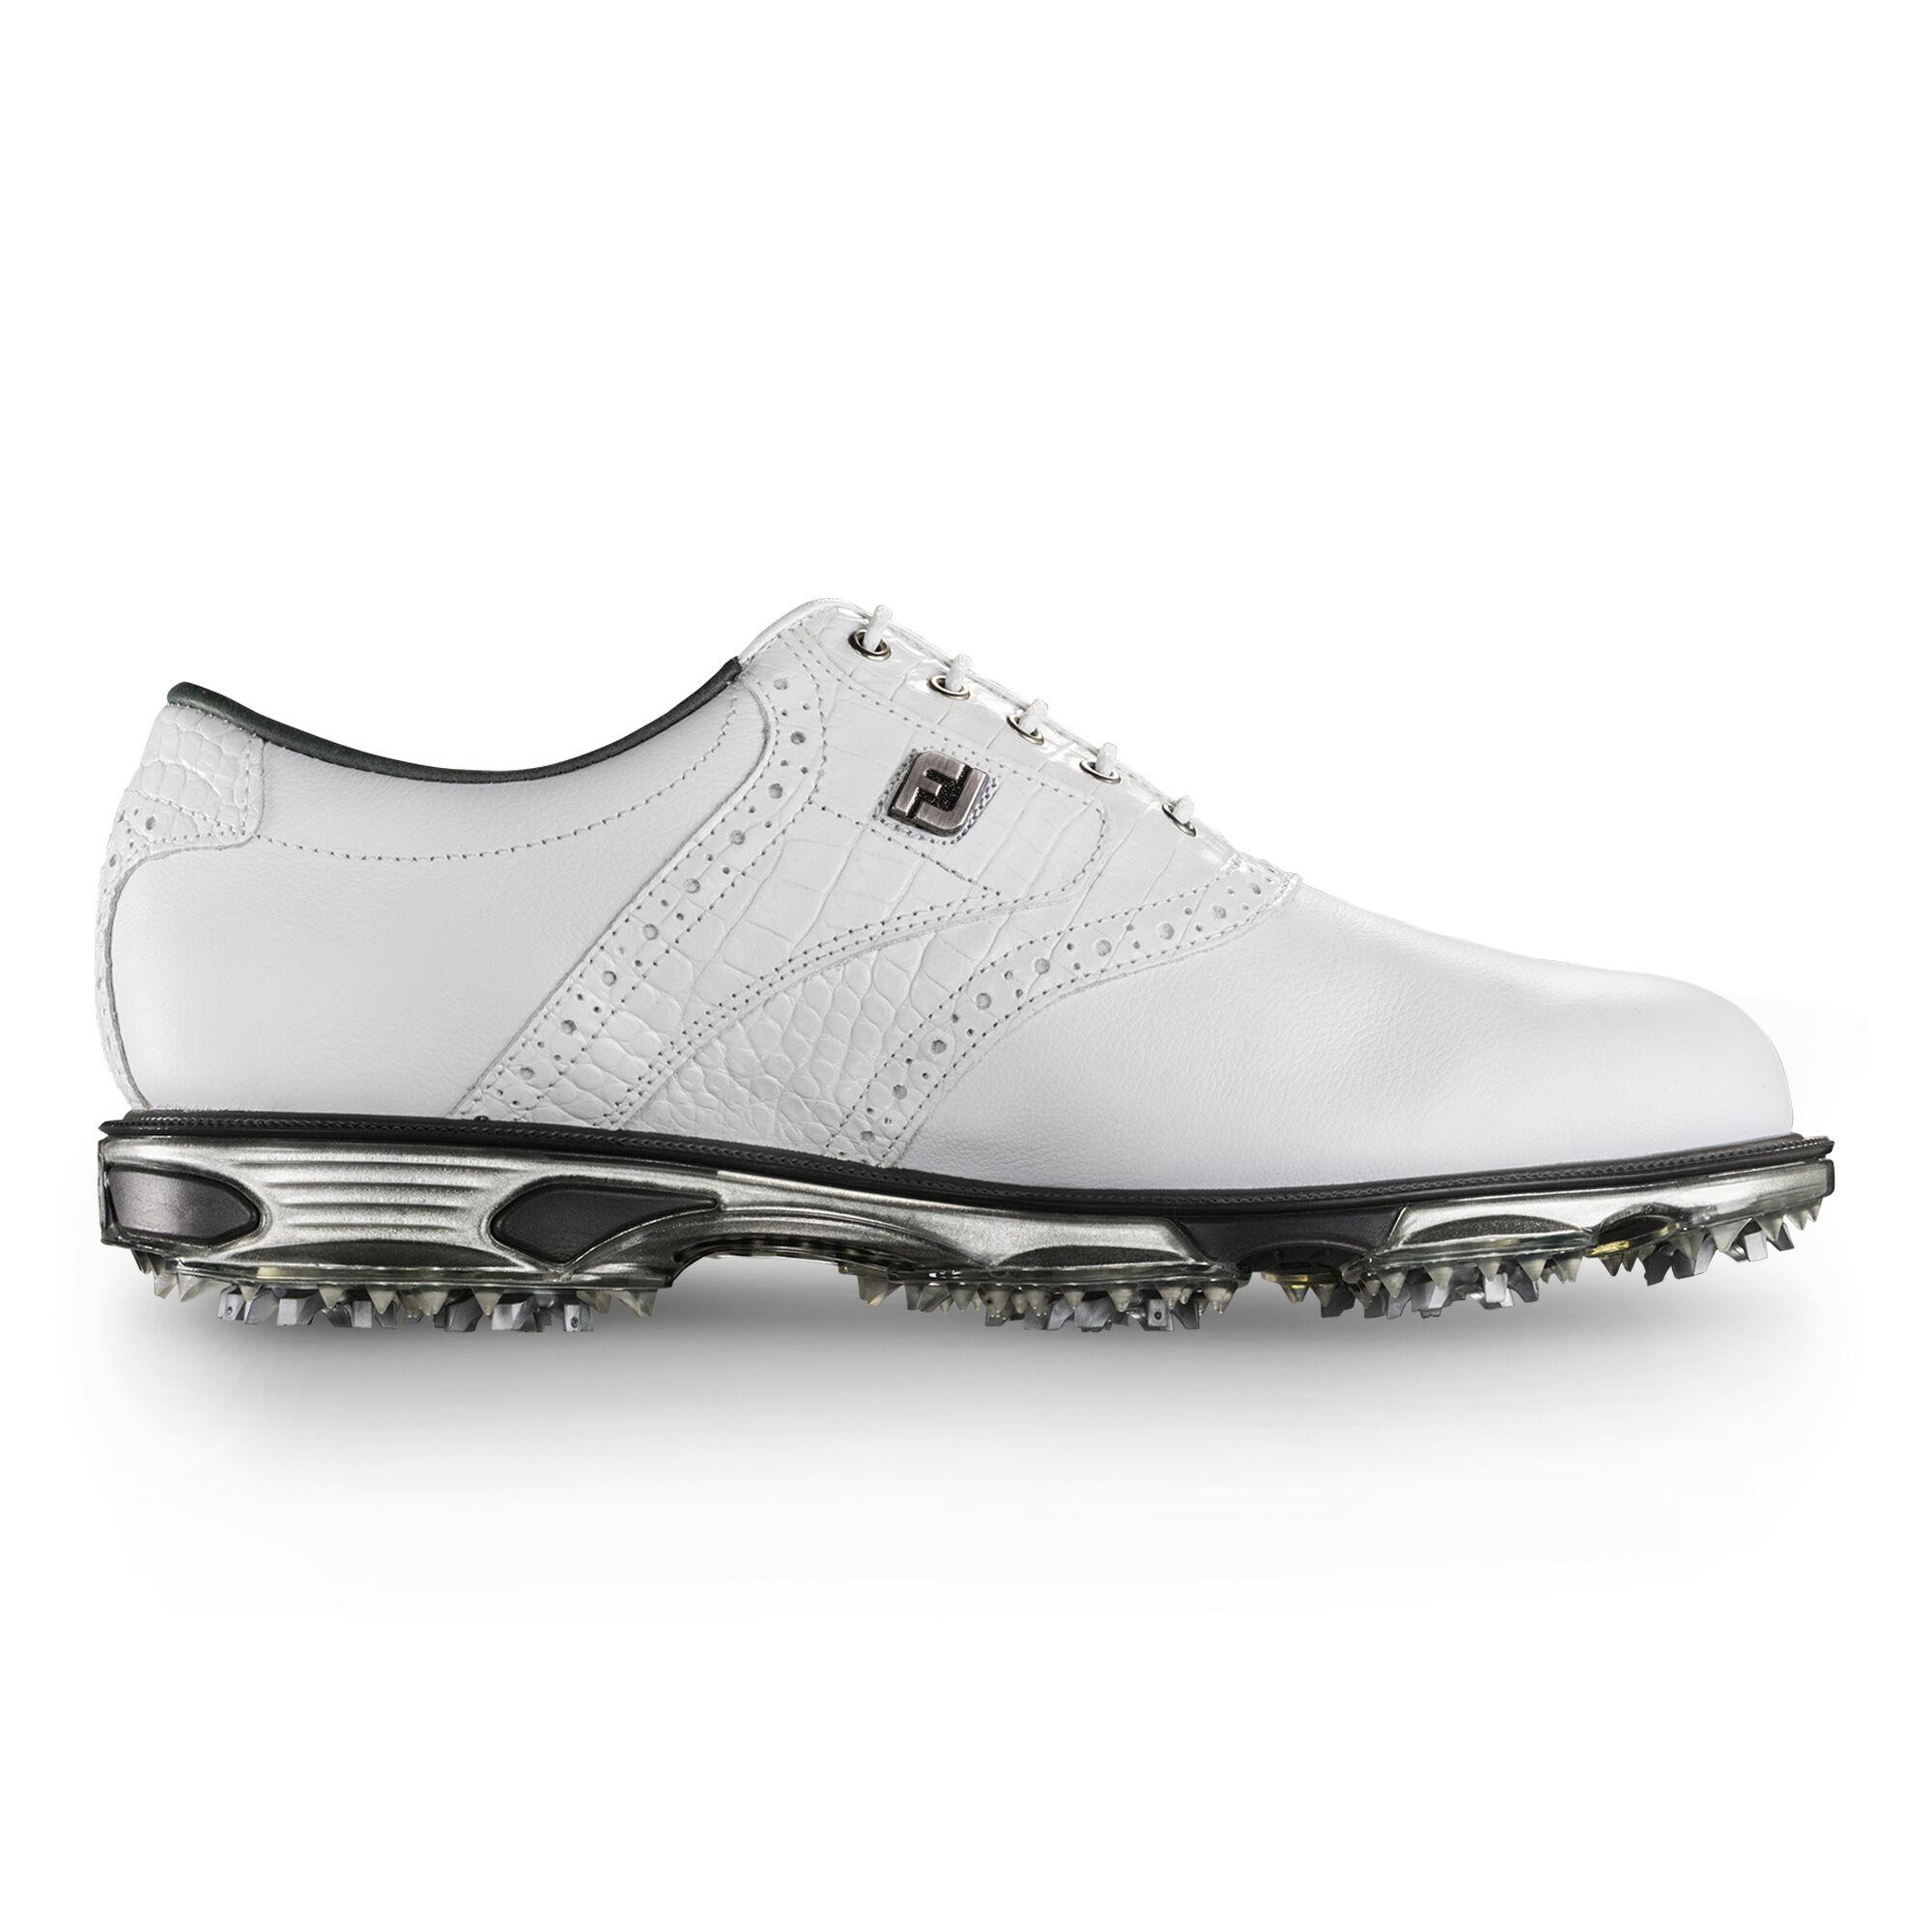 Women's Footjoy Lopro Golf Shoes (Closeout) White/Tan V29s7698